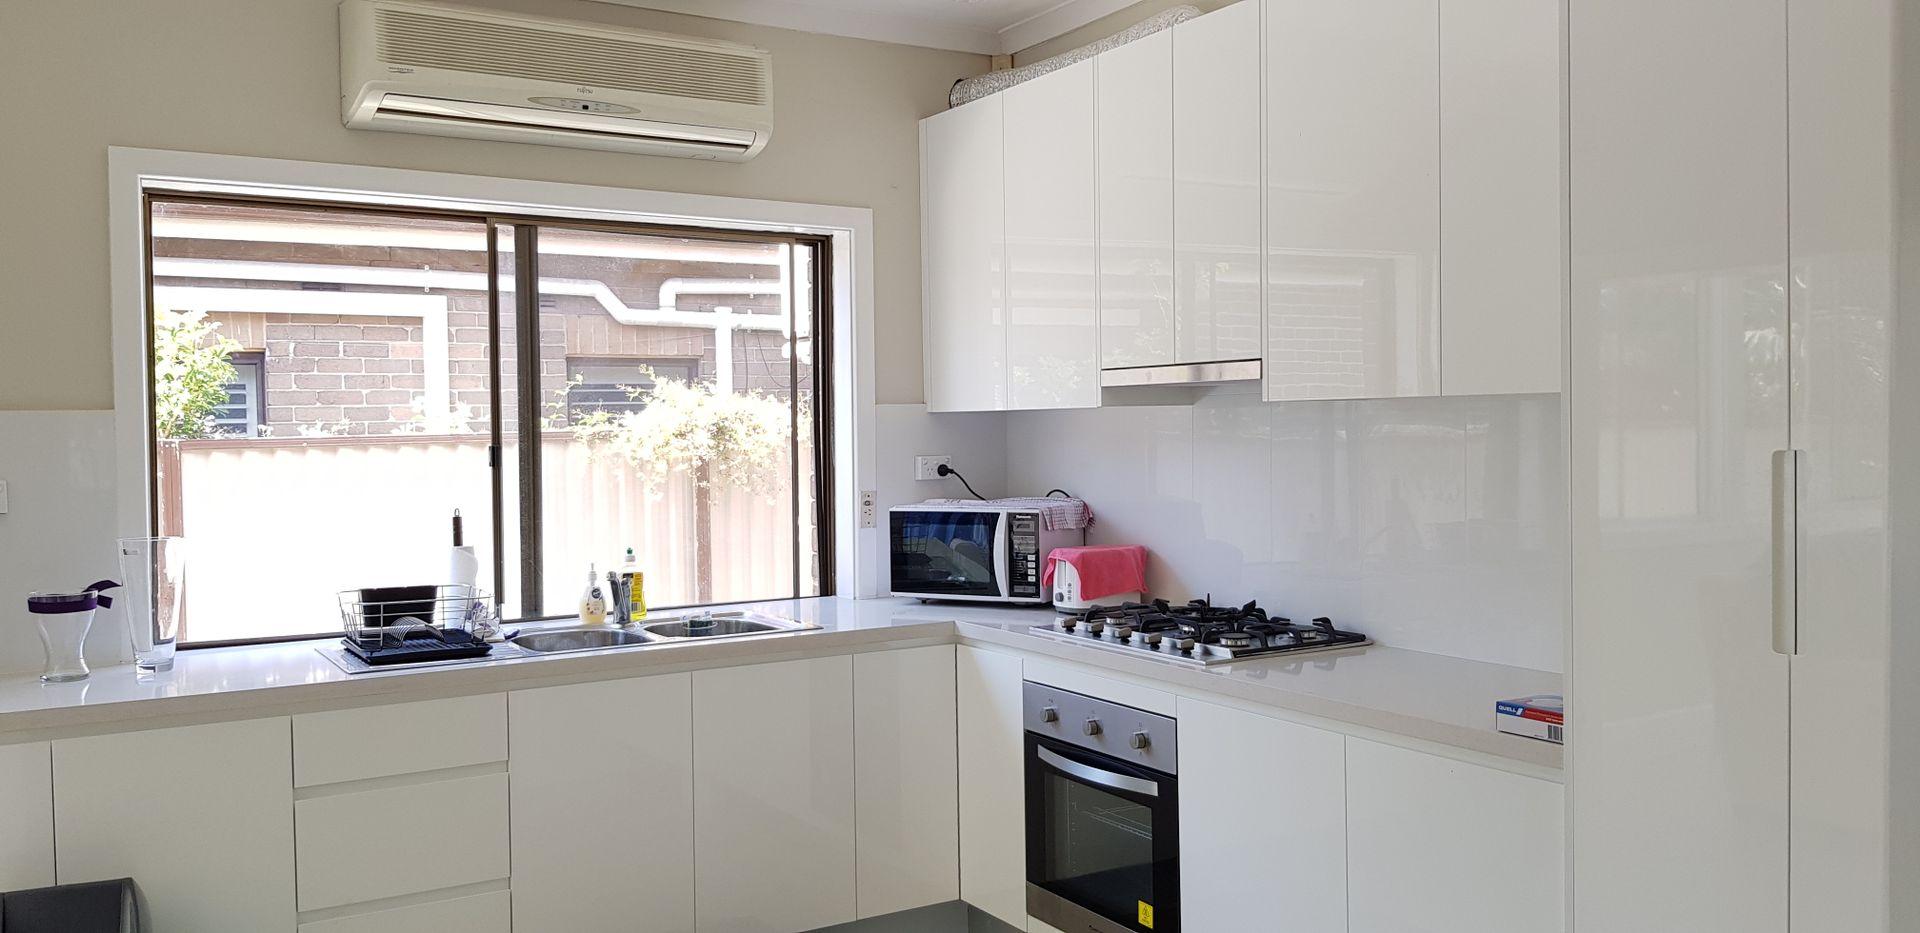 Room A/47 Carinya ave, Mascot NSW 2020, Image 1